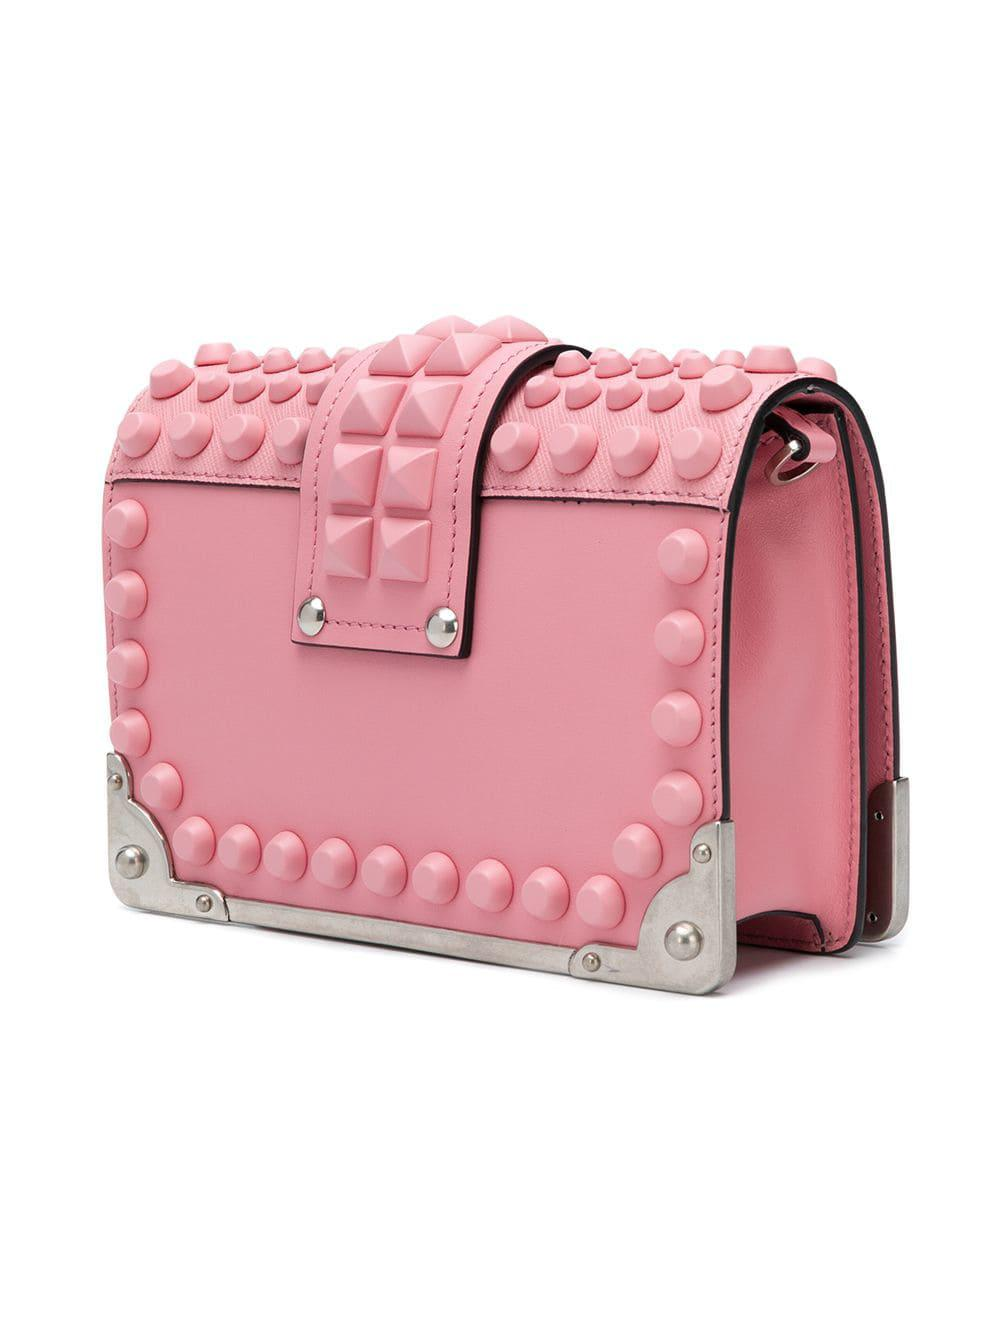 e353706d4cfc ... leather shoulder bag in pink 46e58 ec3a8; shop prada pink studded  saffiano cahier bag lyst. view fullscreen 7c194 60c4d